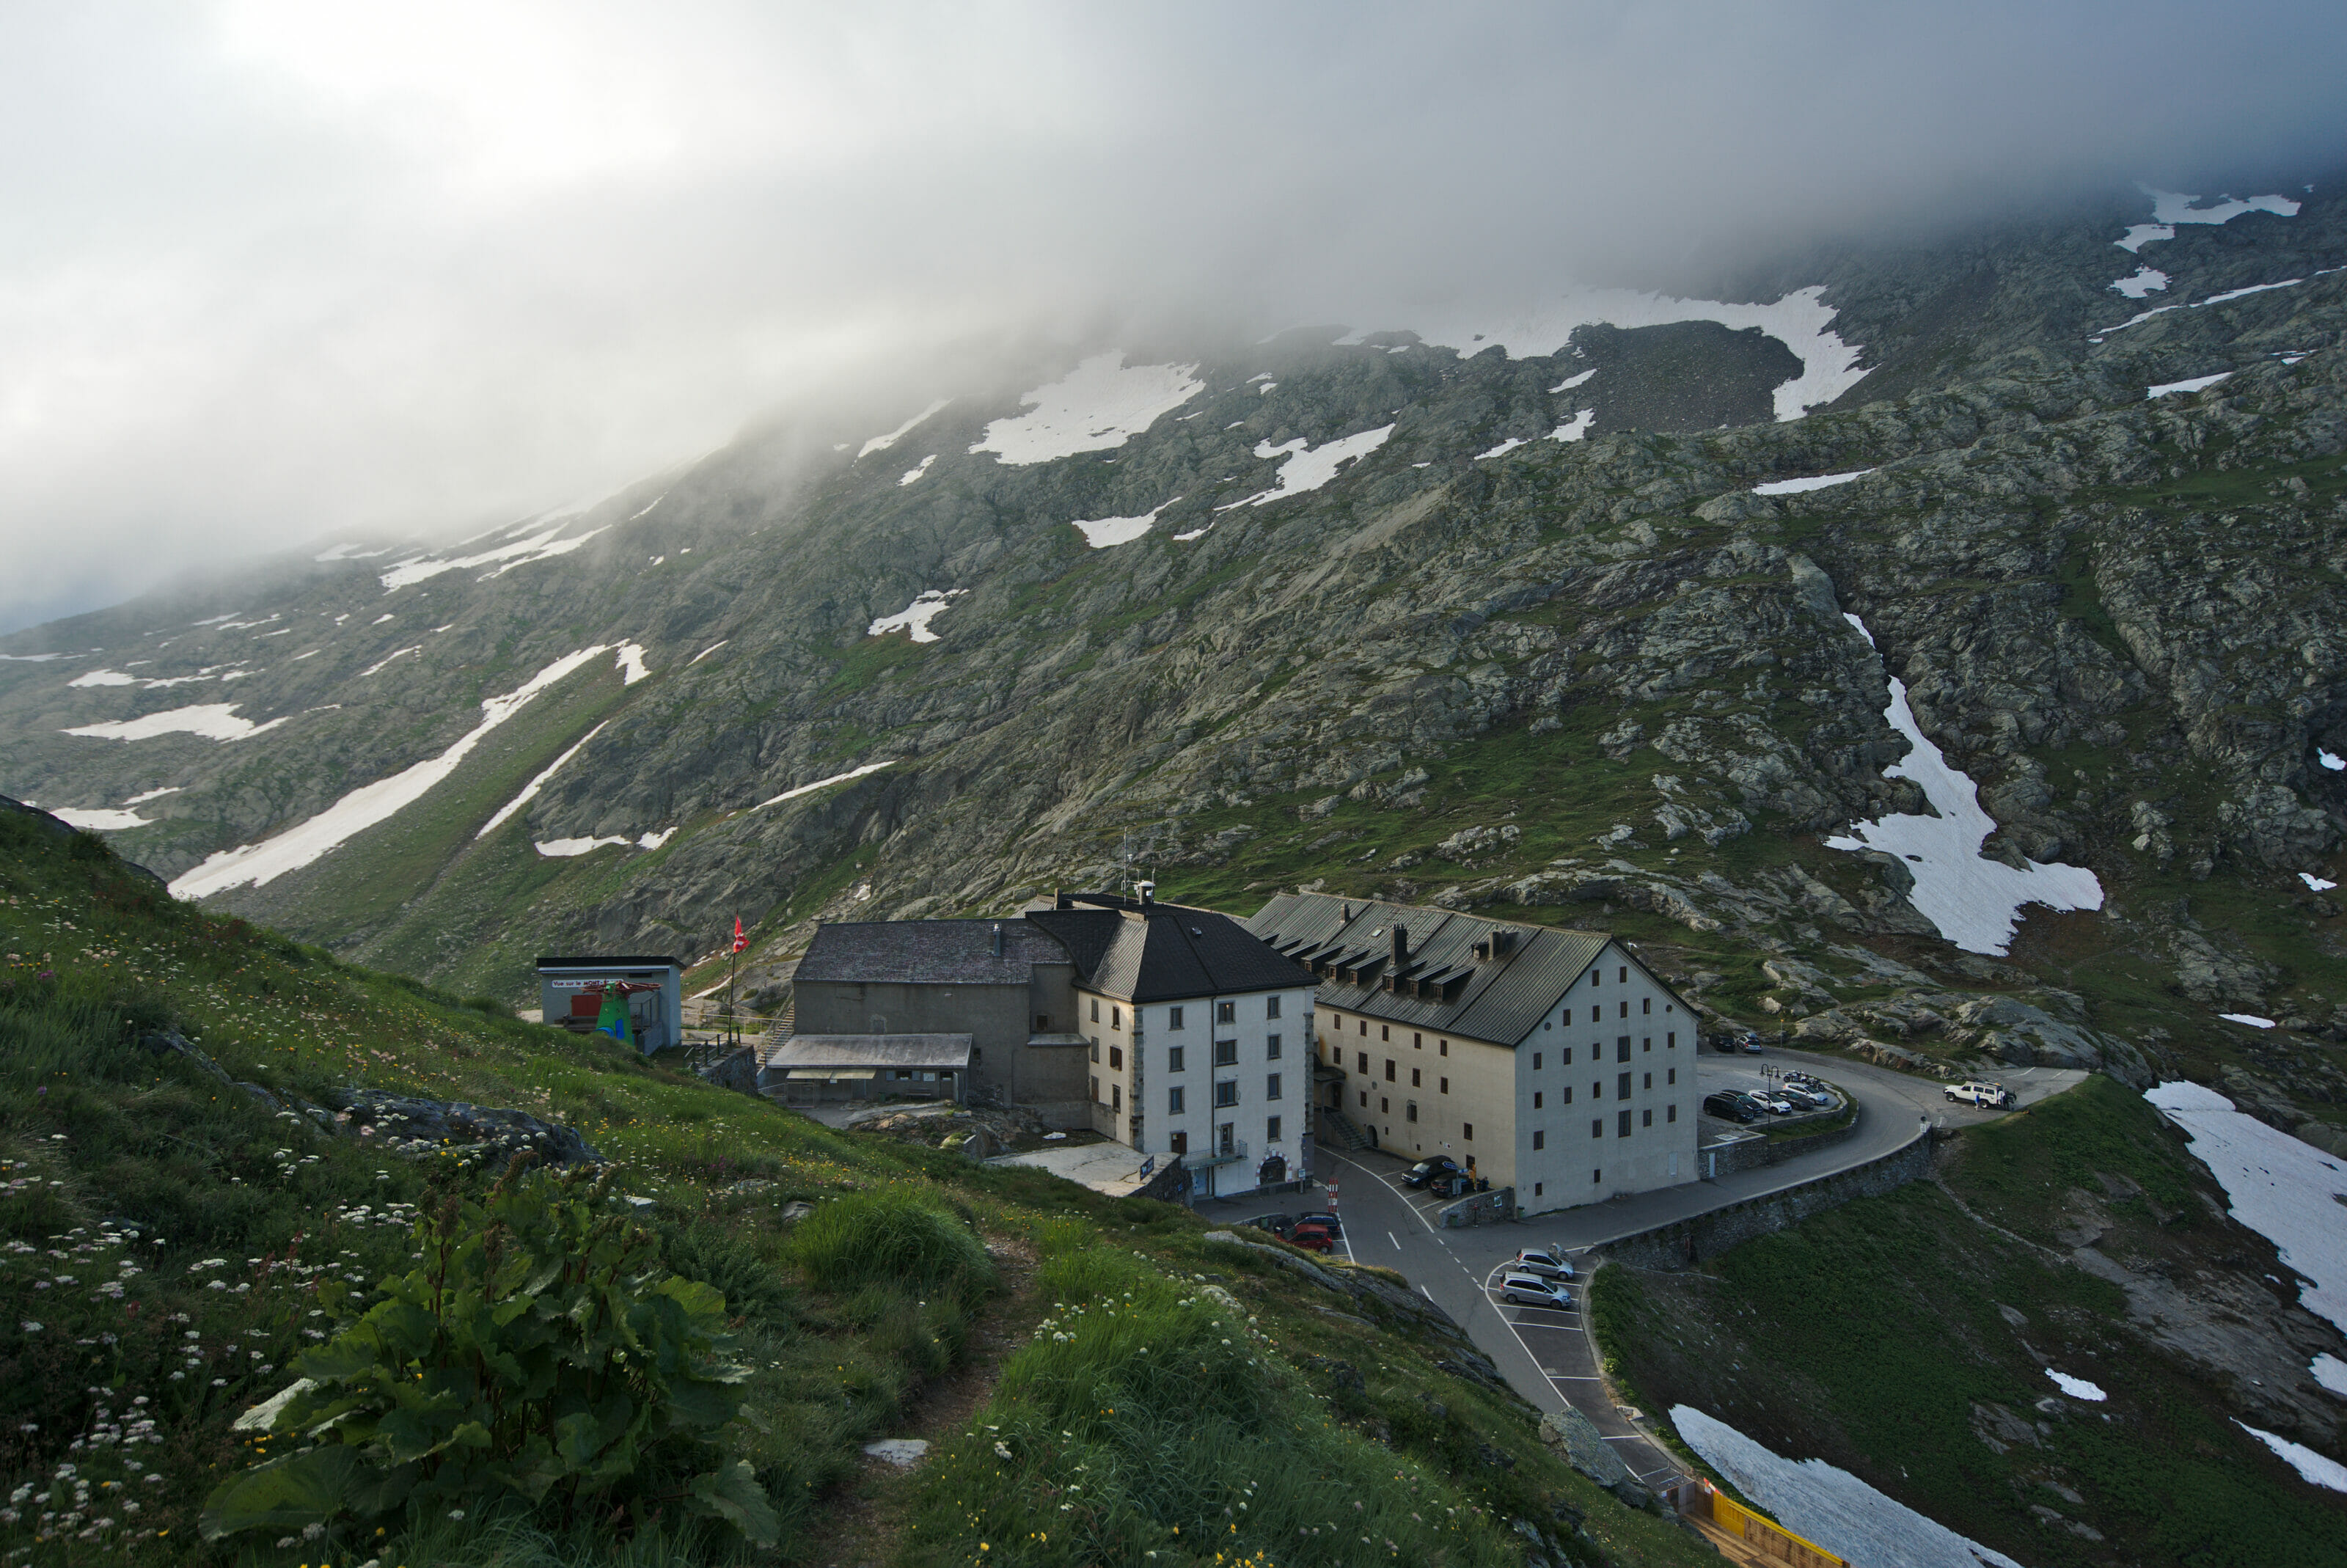 l'hospice du col du saint-bernard